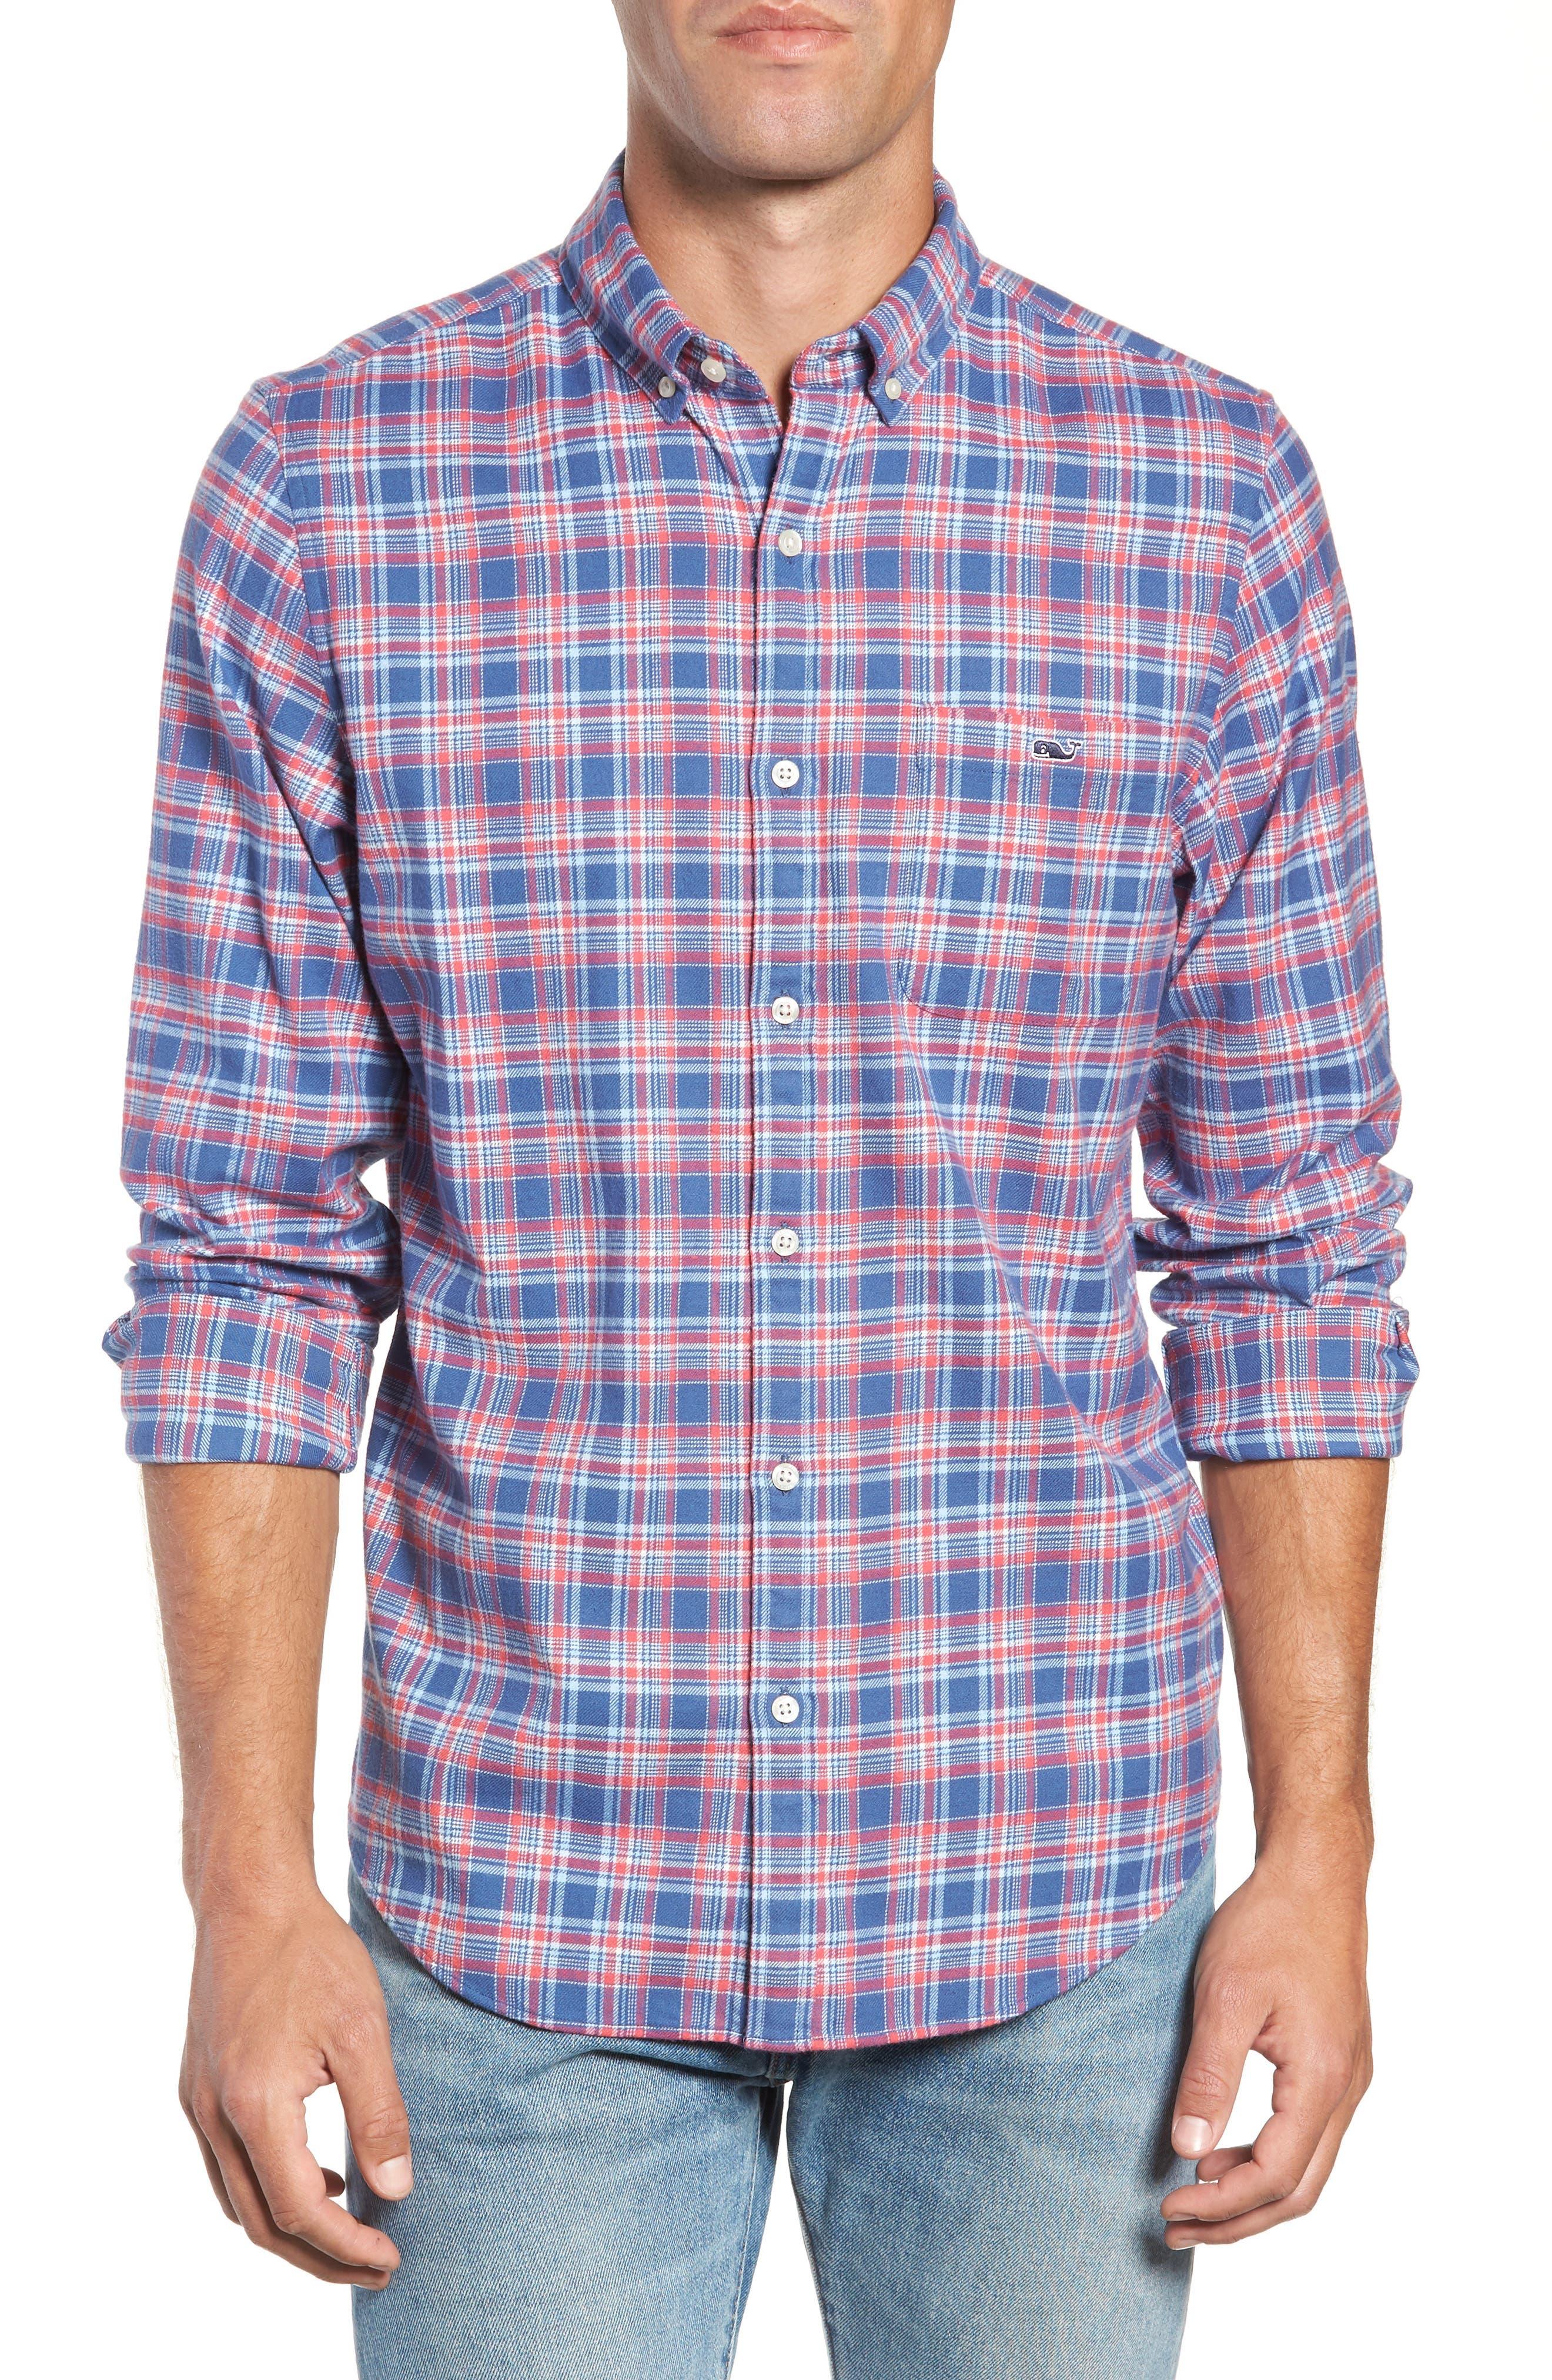 VINEYARD VINES Lockwood Regular Fit Plaid Flannel Shirt in Flag Blue